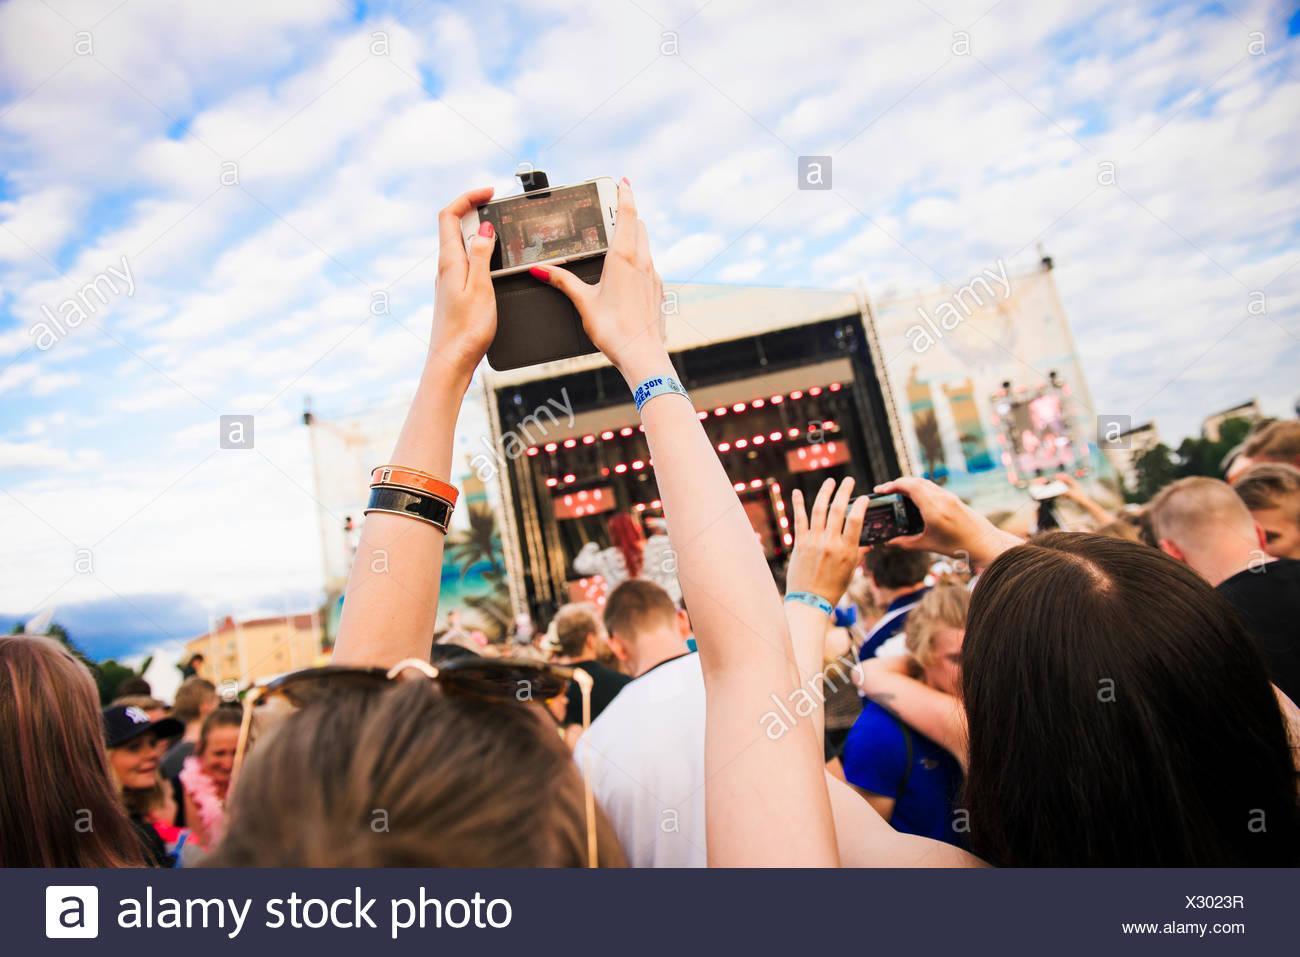 La Finlande, Satakunta, Rauma, les gens s'amuser à concert pop Photo Stock